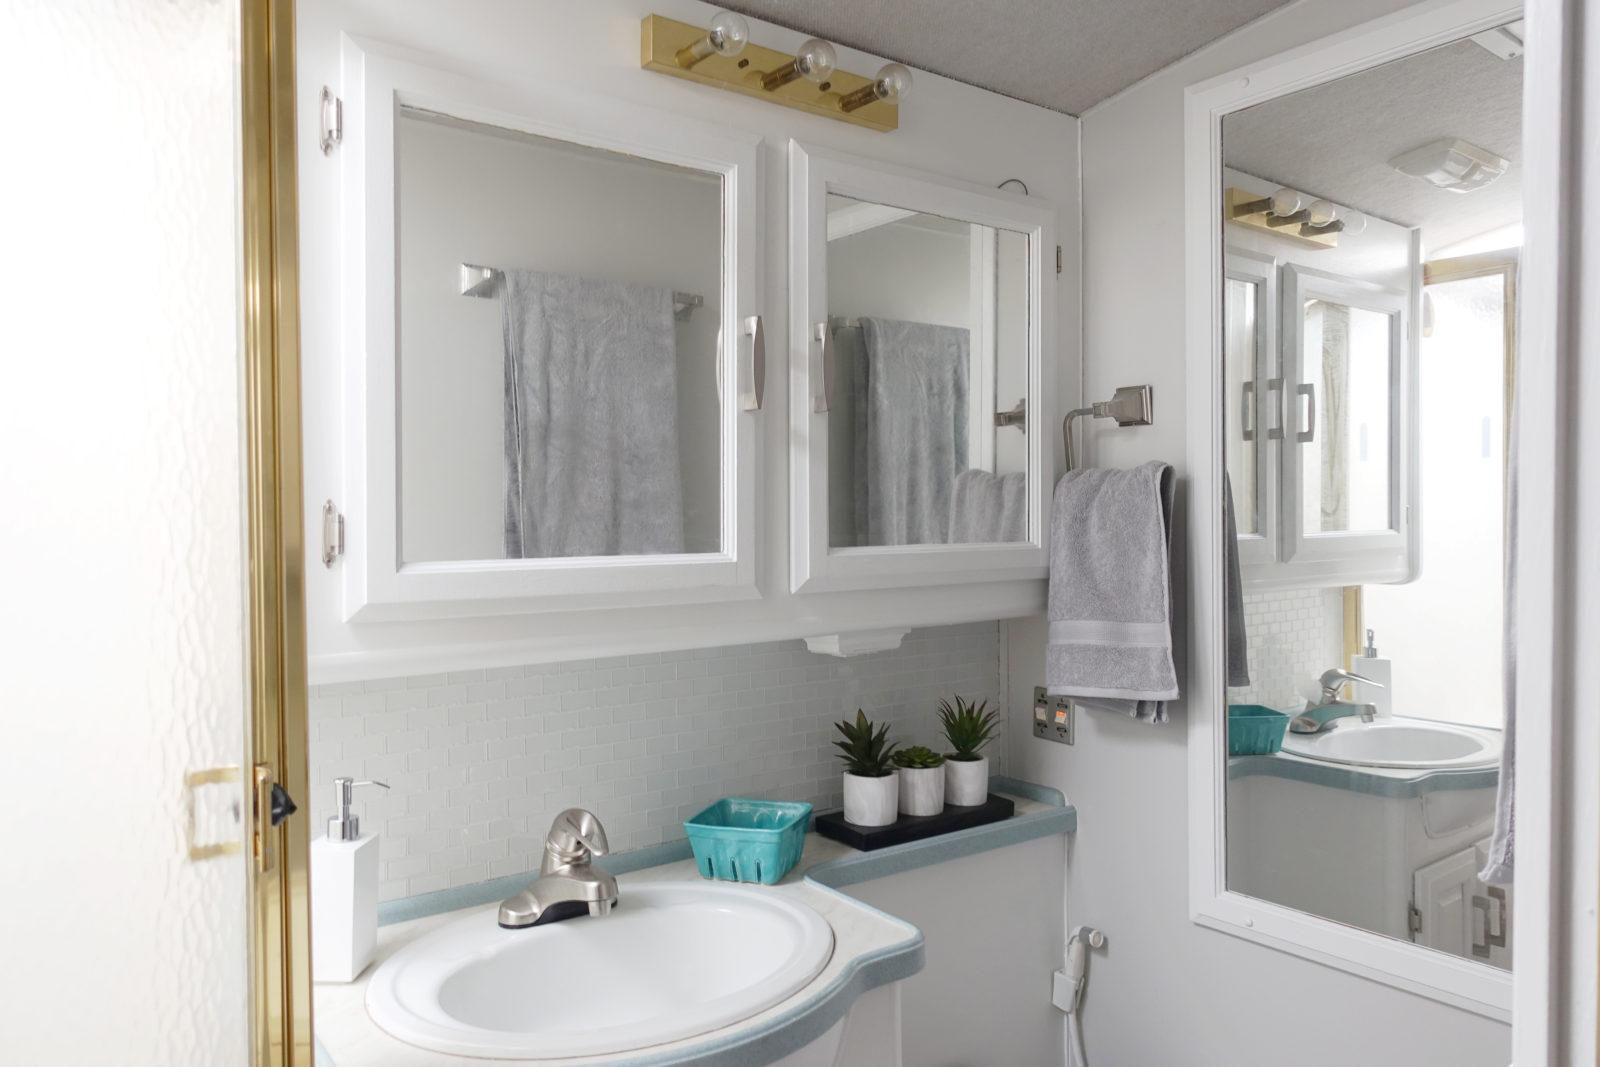 RV Bathroom Hardware Upgrade  Hudson and Emily